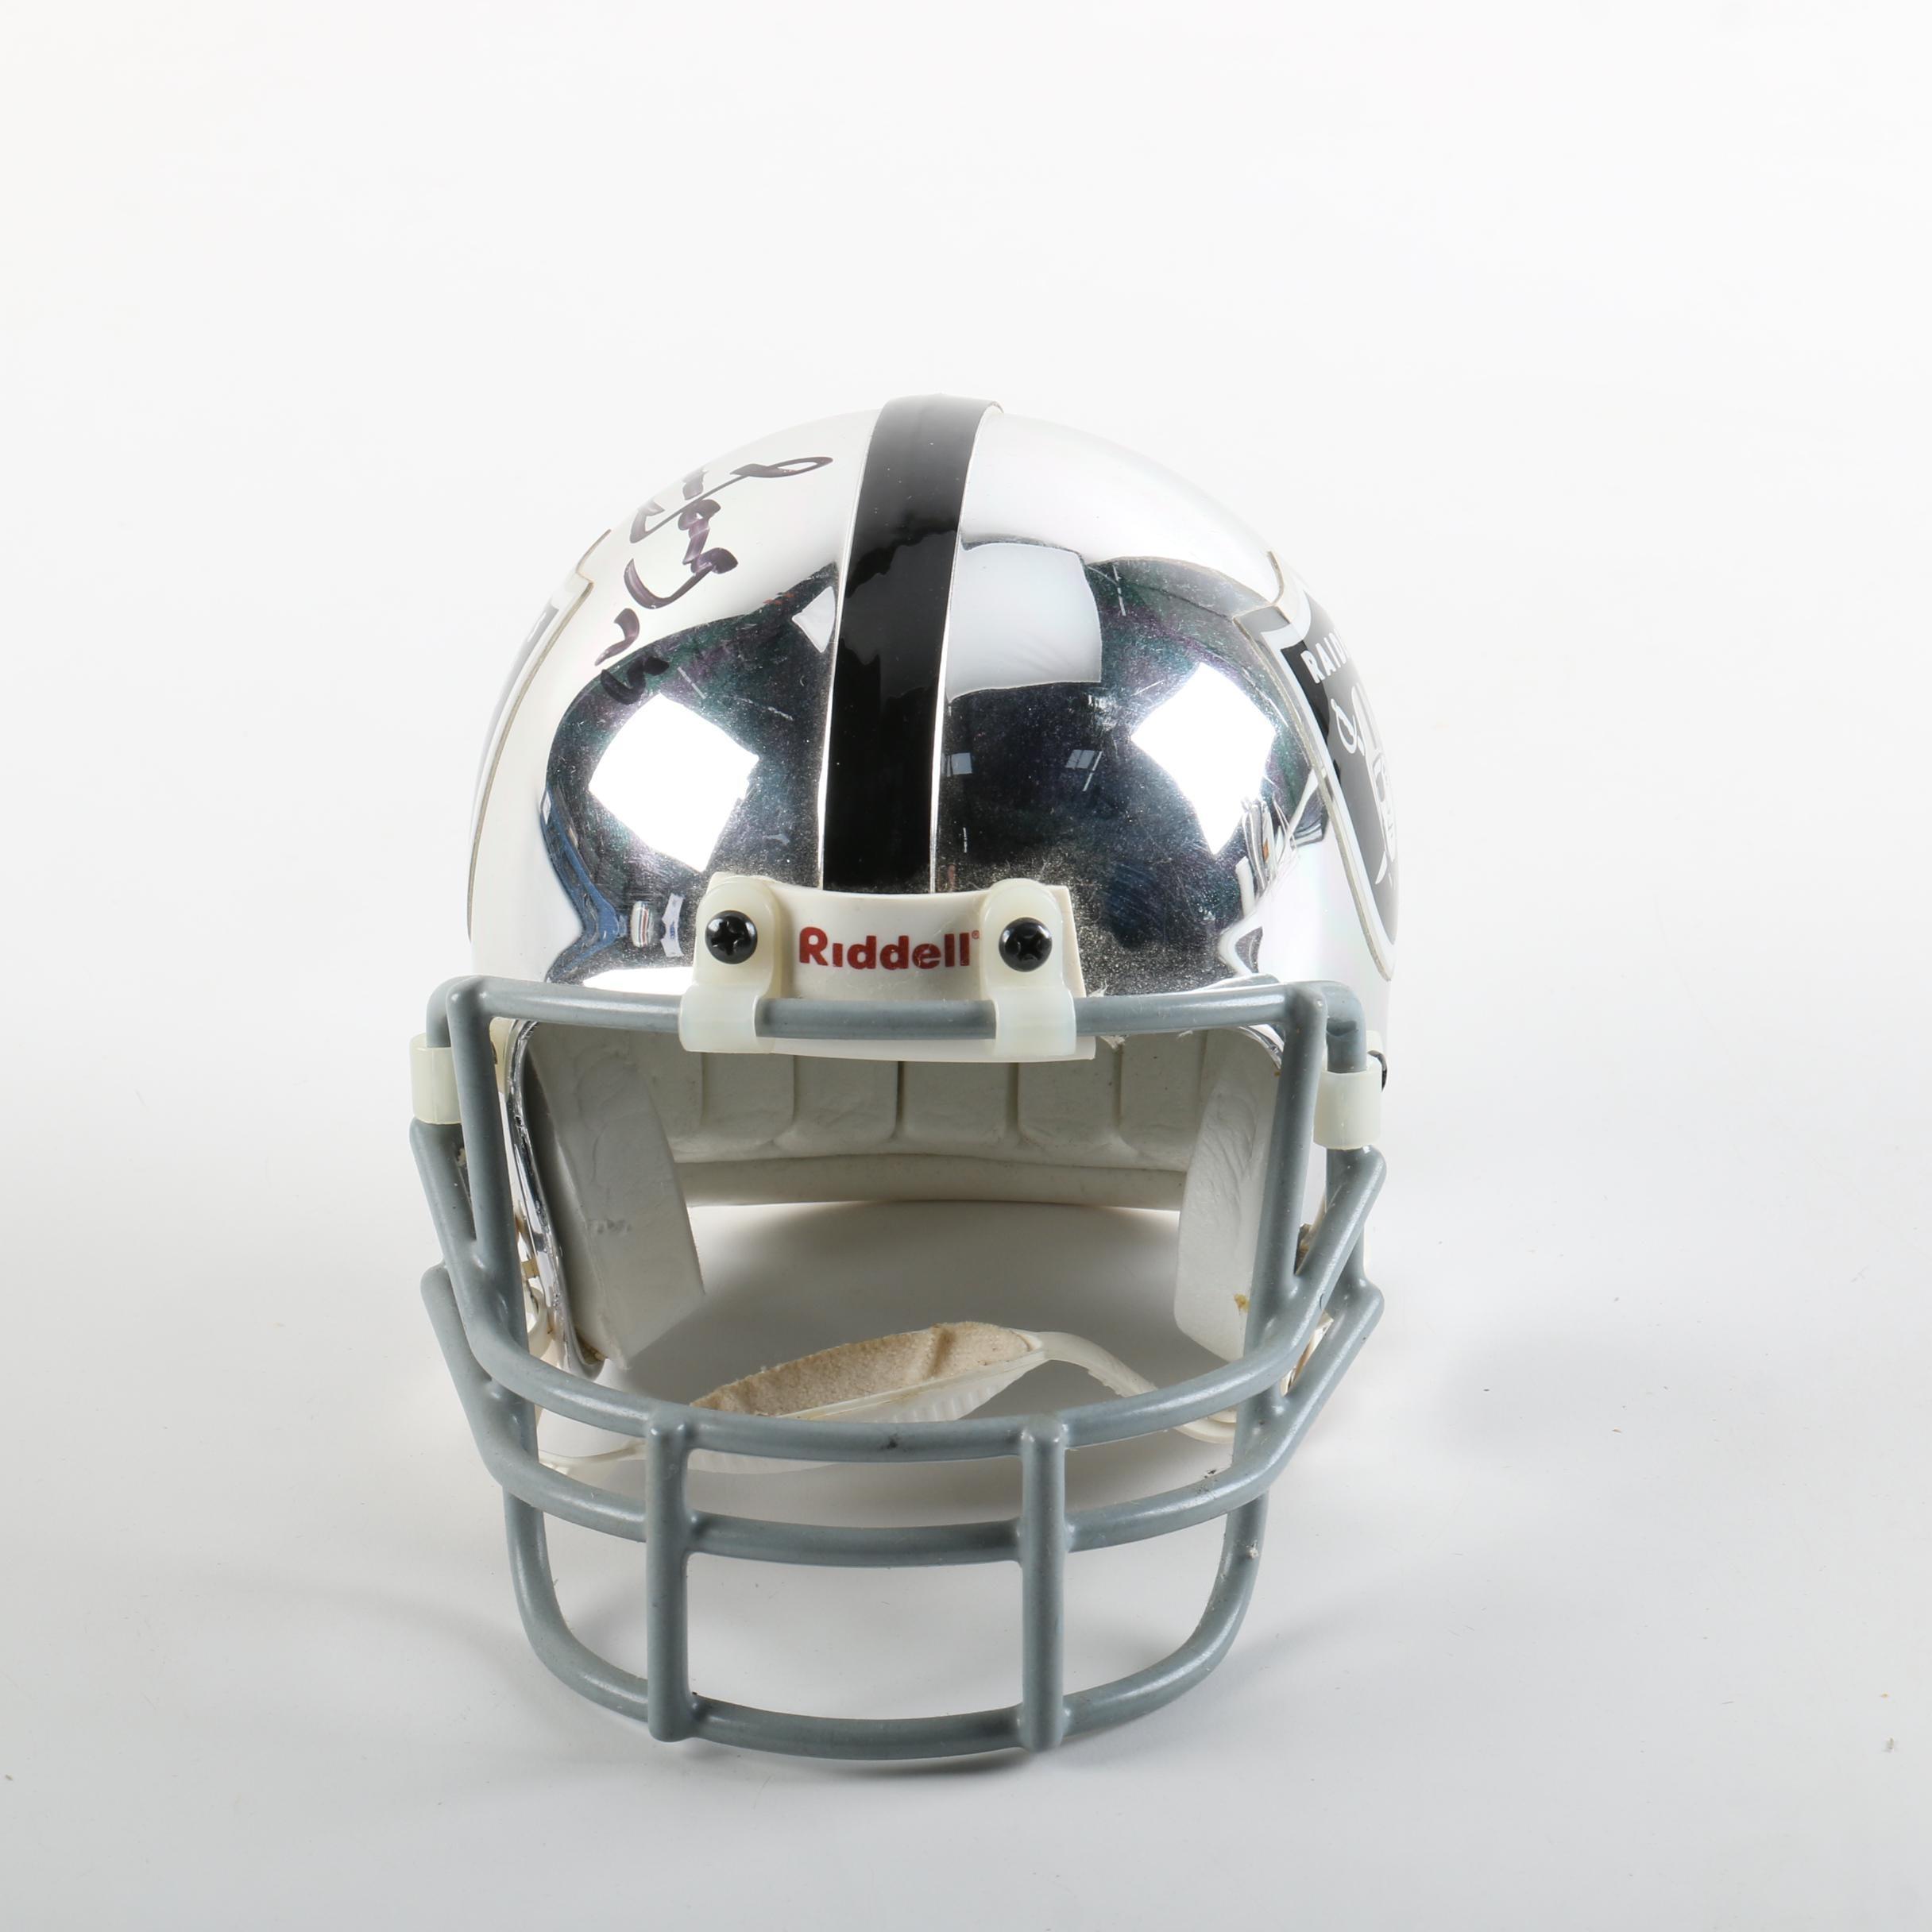 Howie Long Autographed Mini Helmet